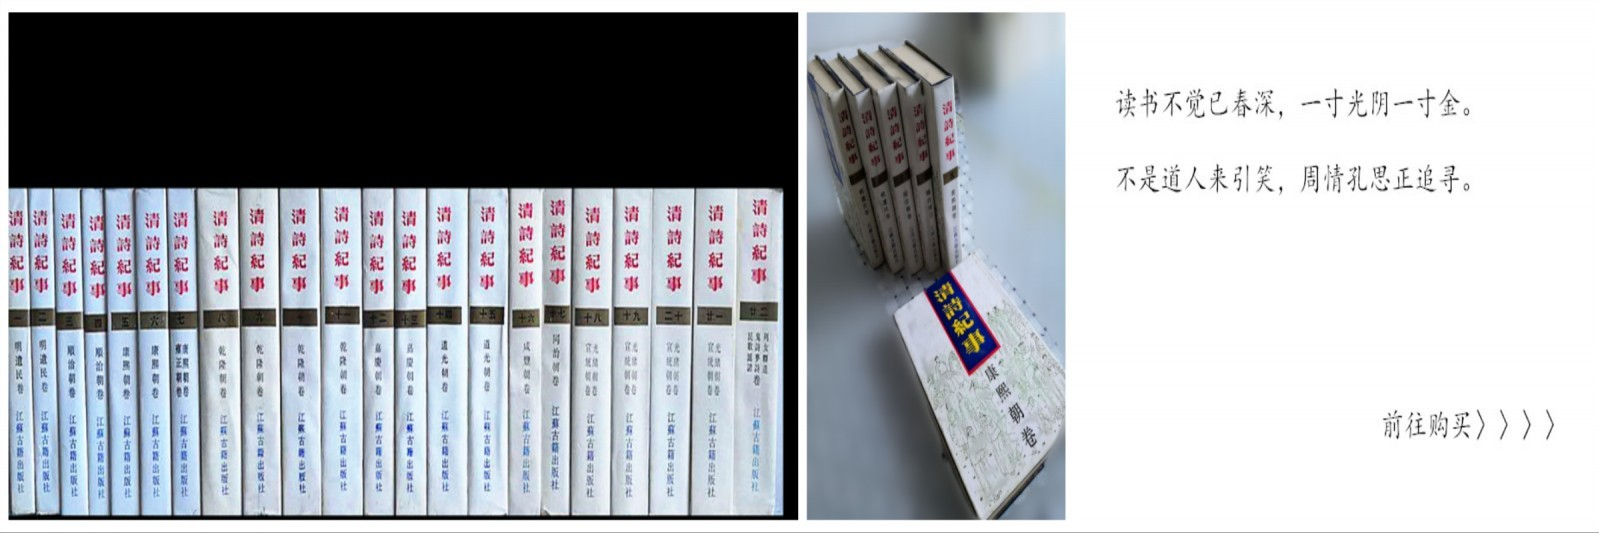 http://book.kongfz.com/273213/1206305166/